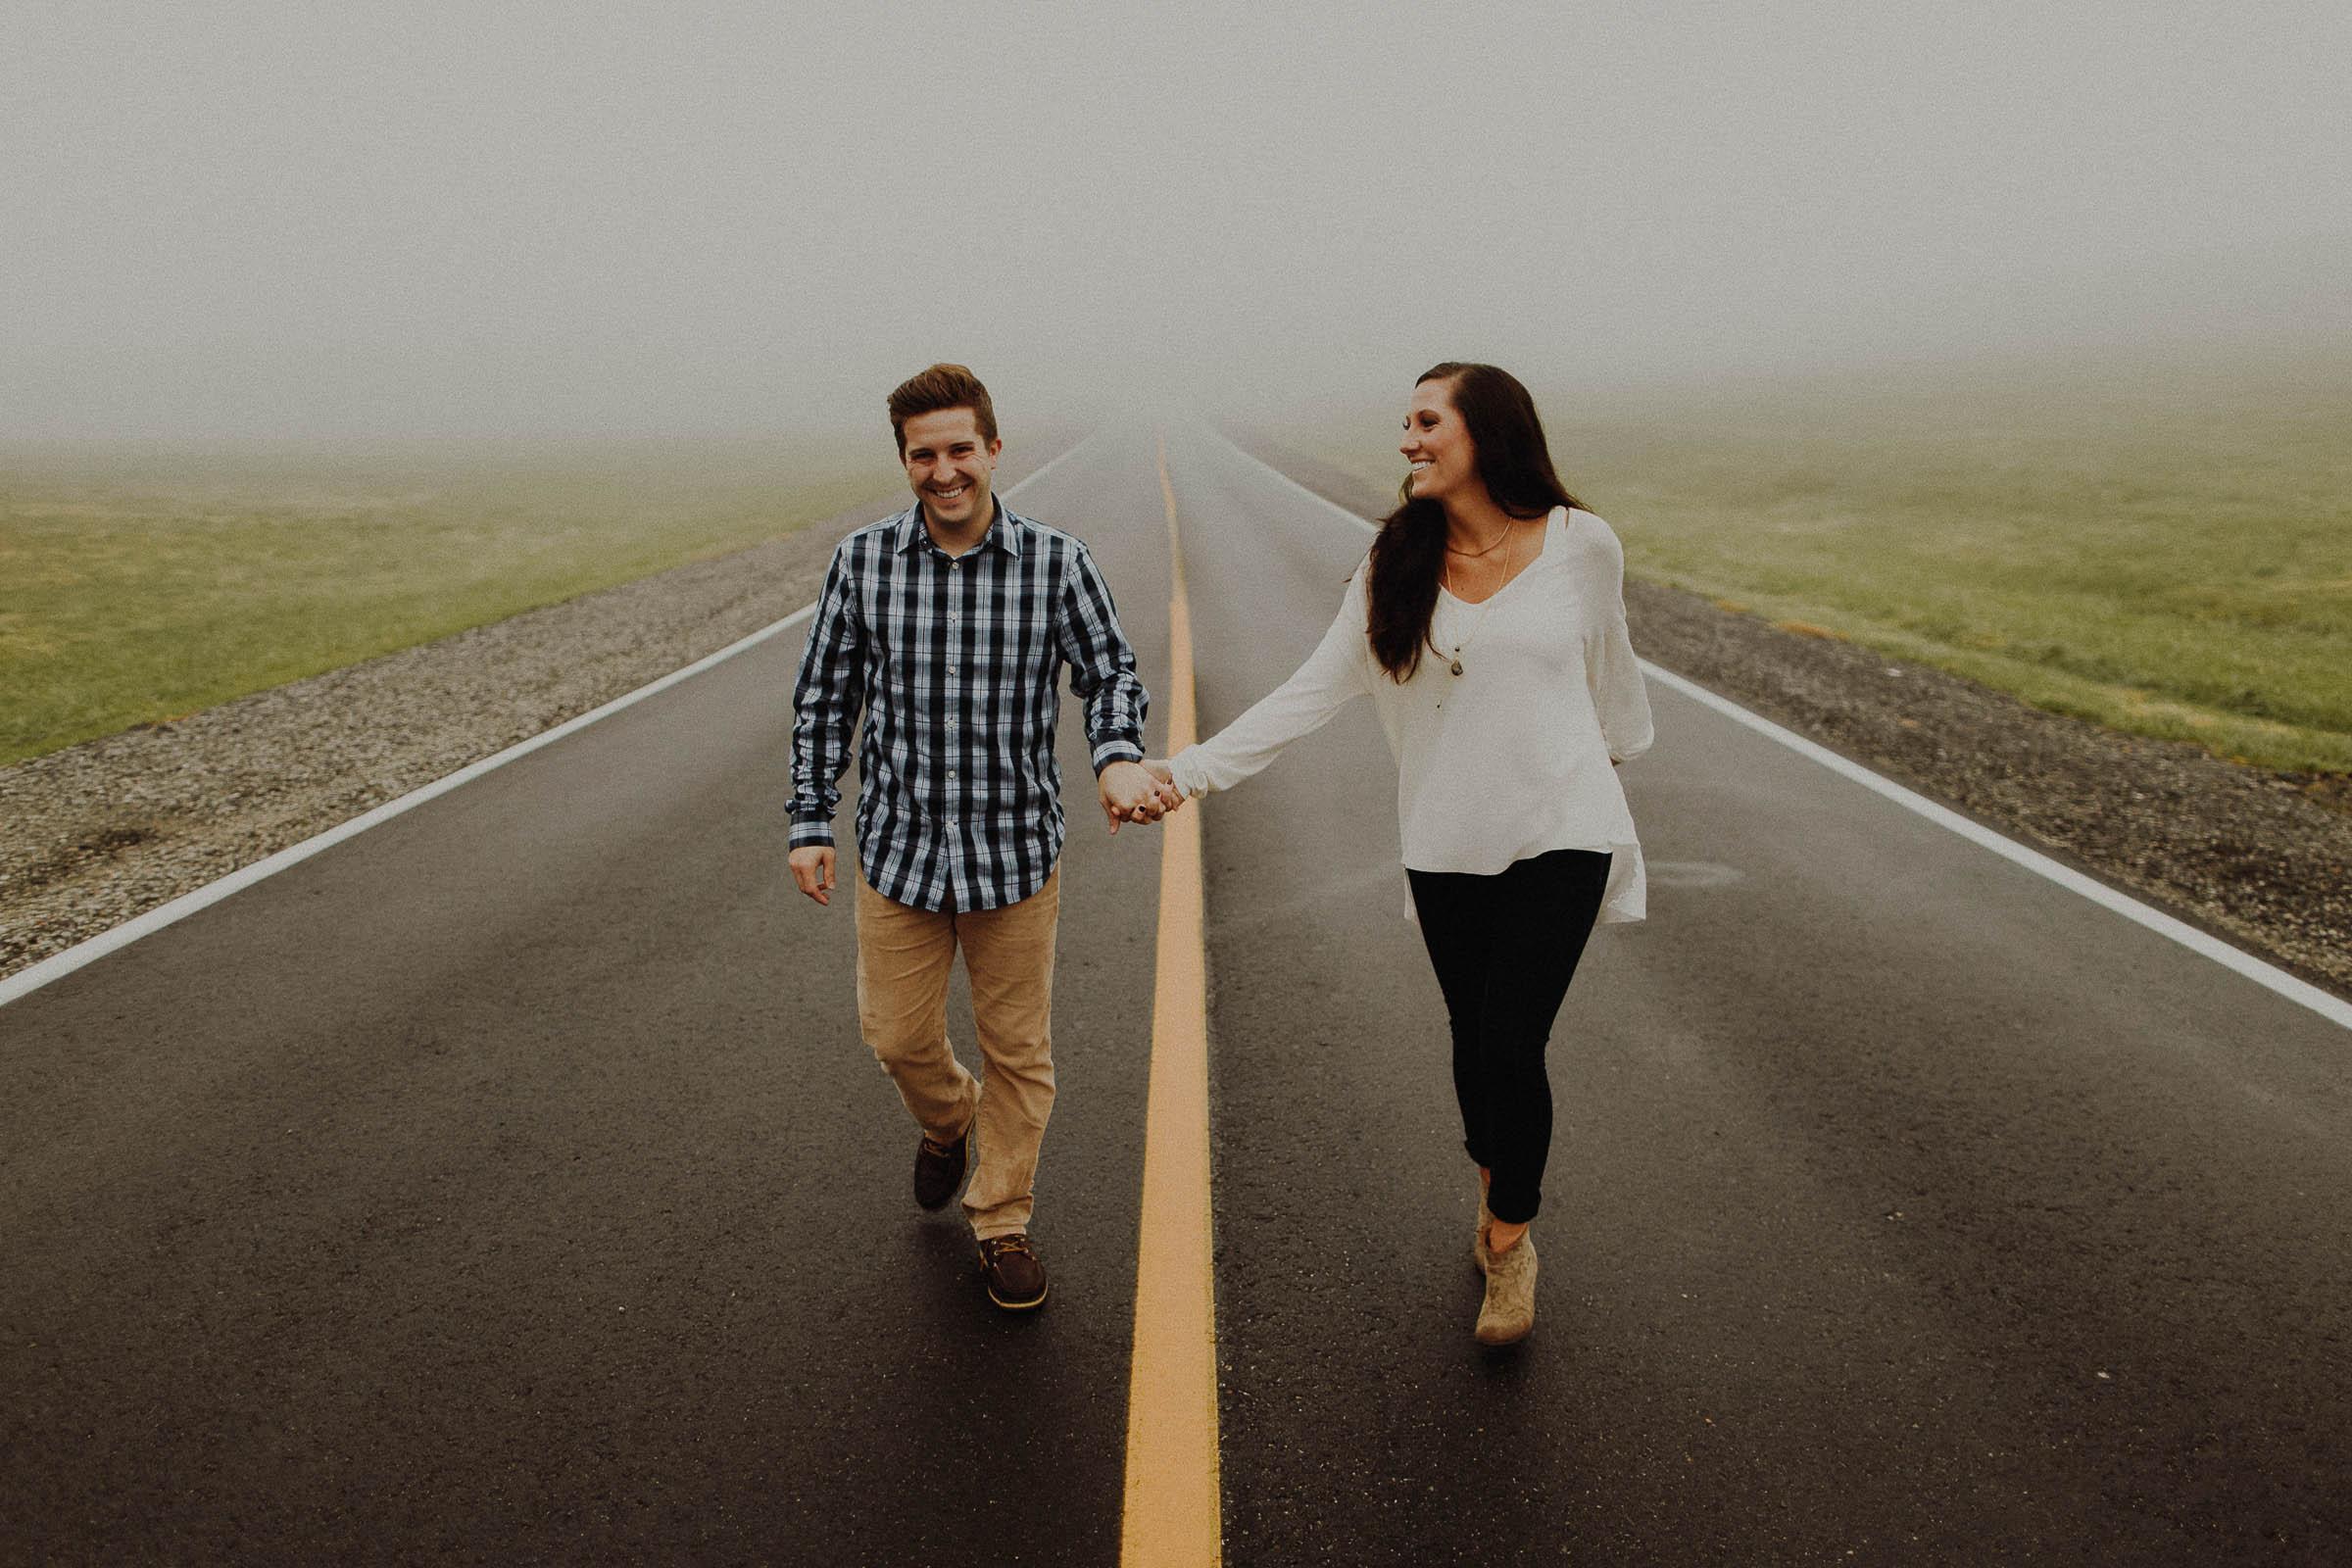 Josh + Kaitlin  Foggy Omaha, Nebraska Engagement Session     View